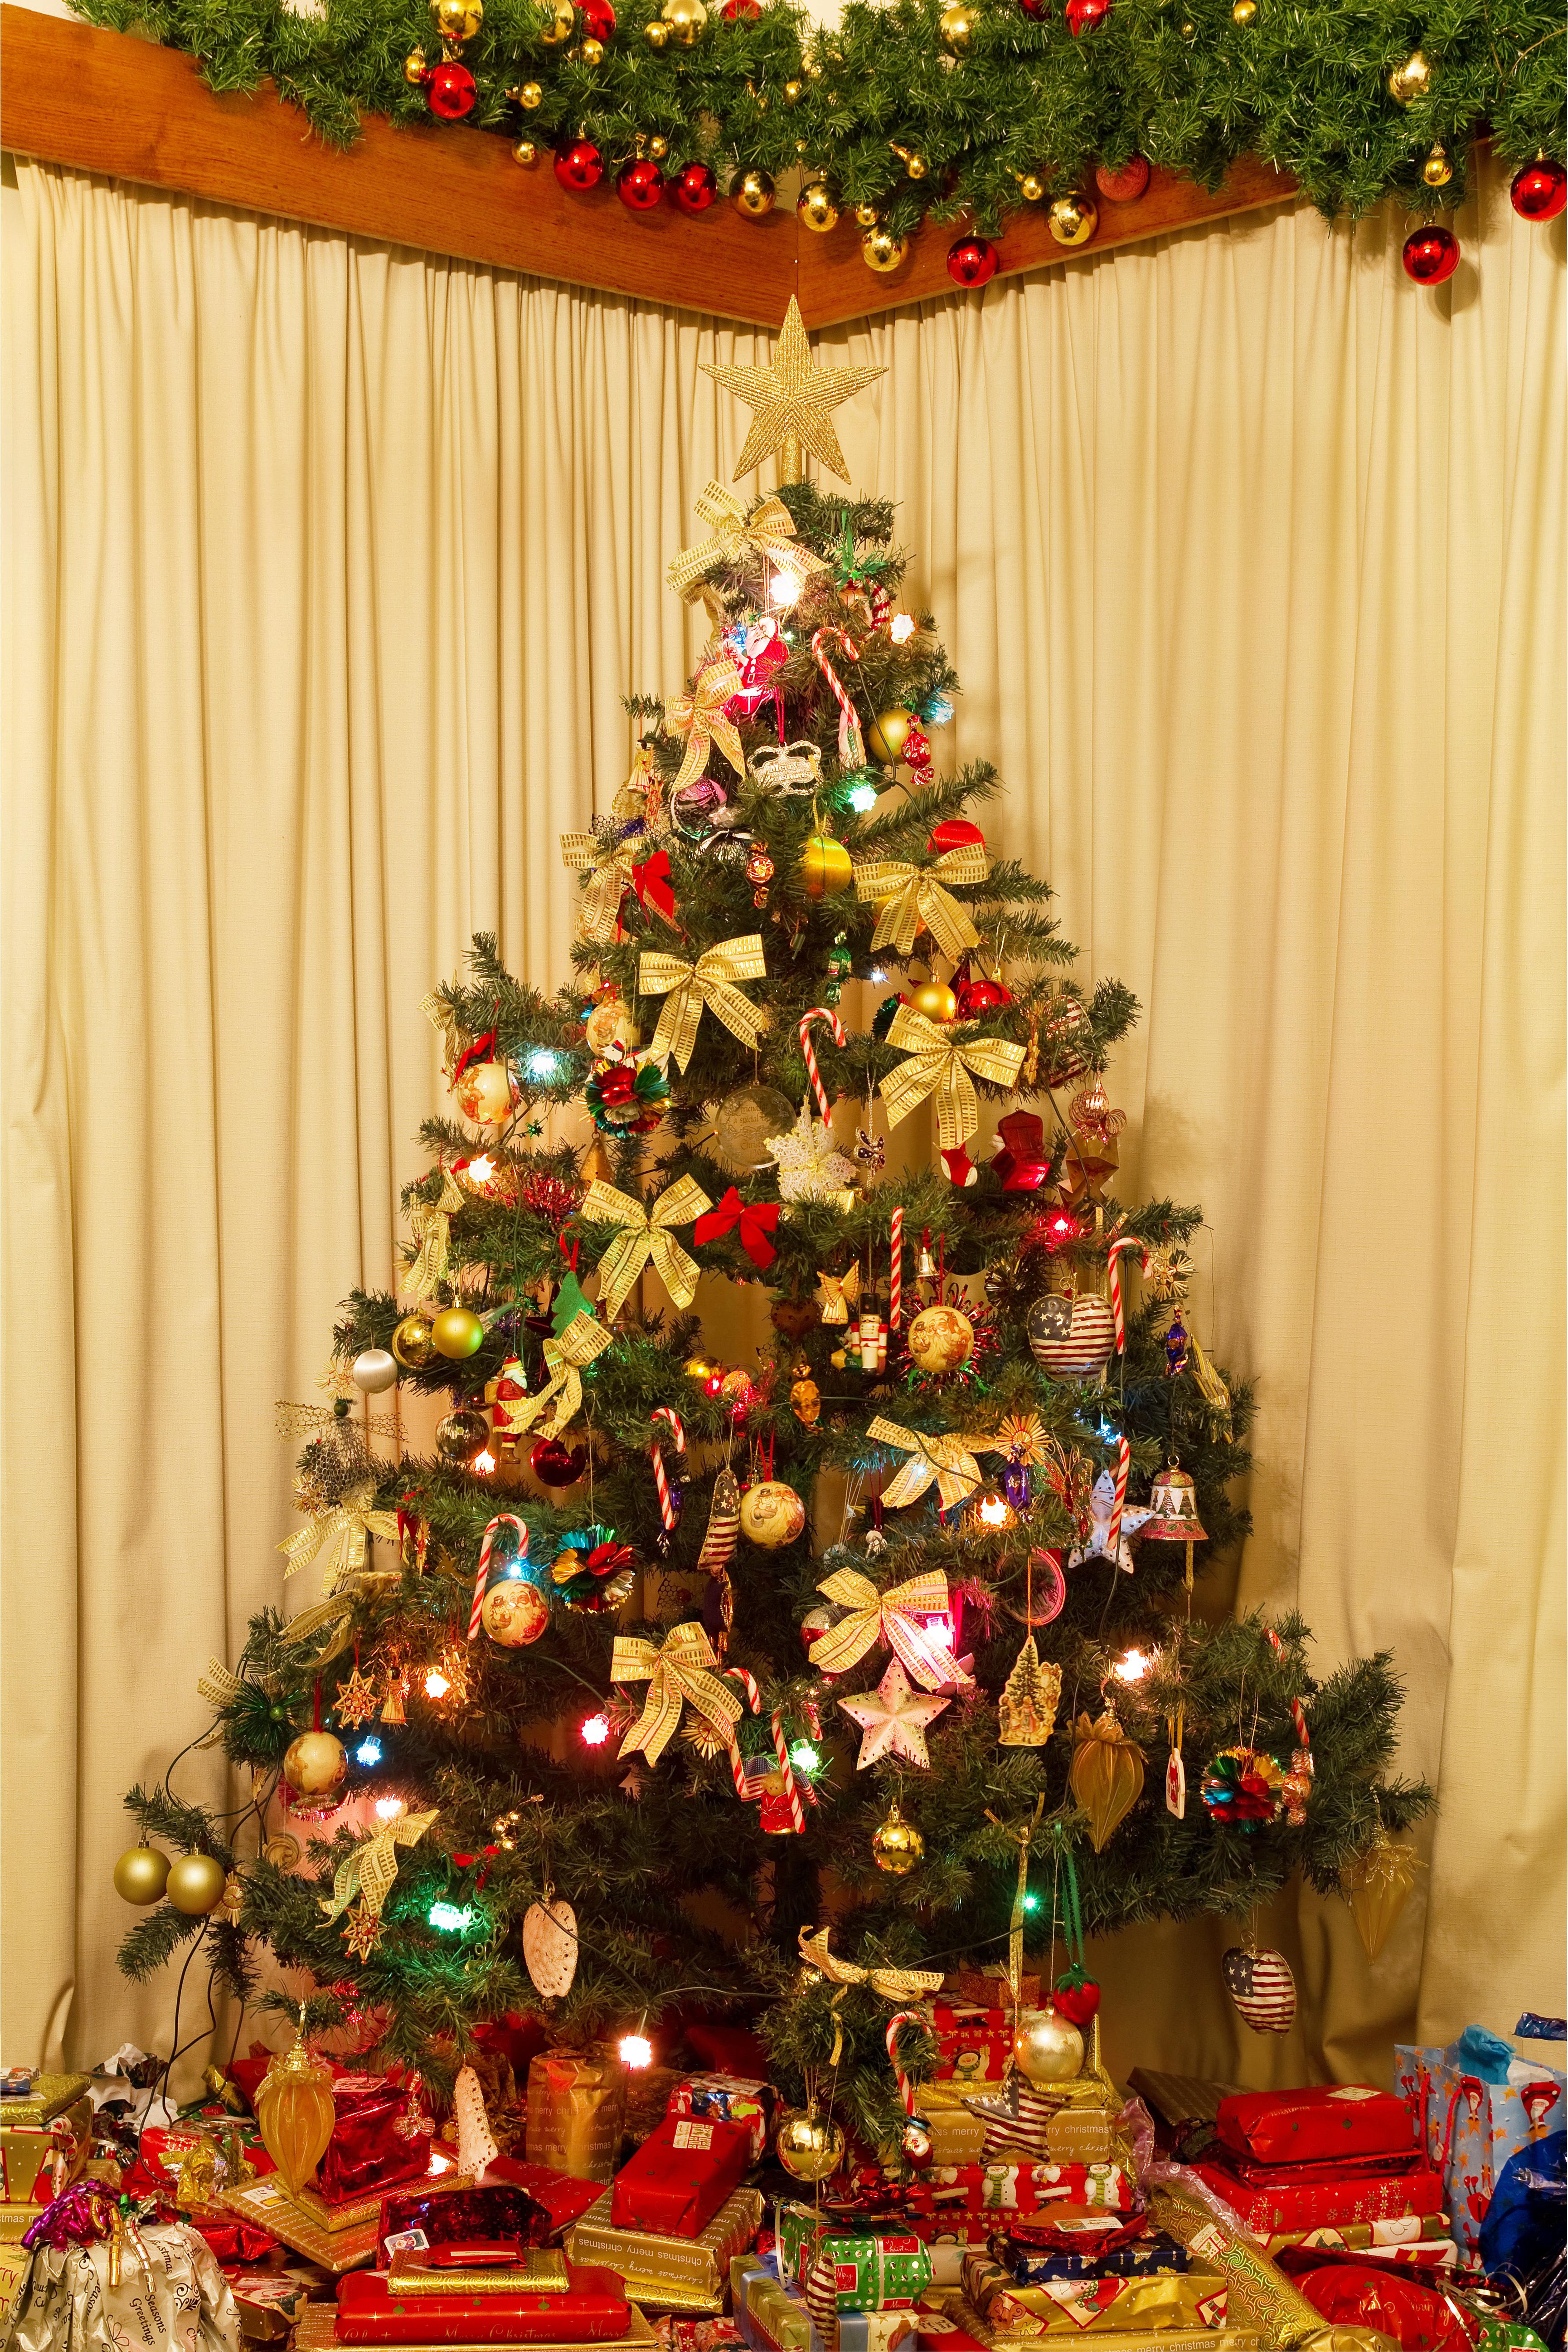 ChristmasTree141123-02